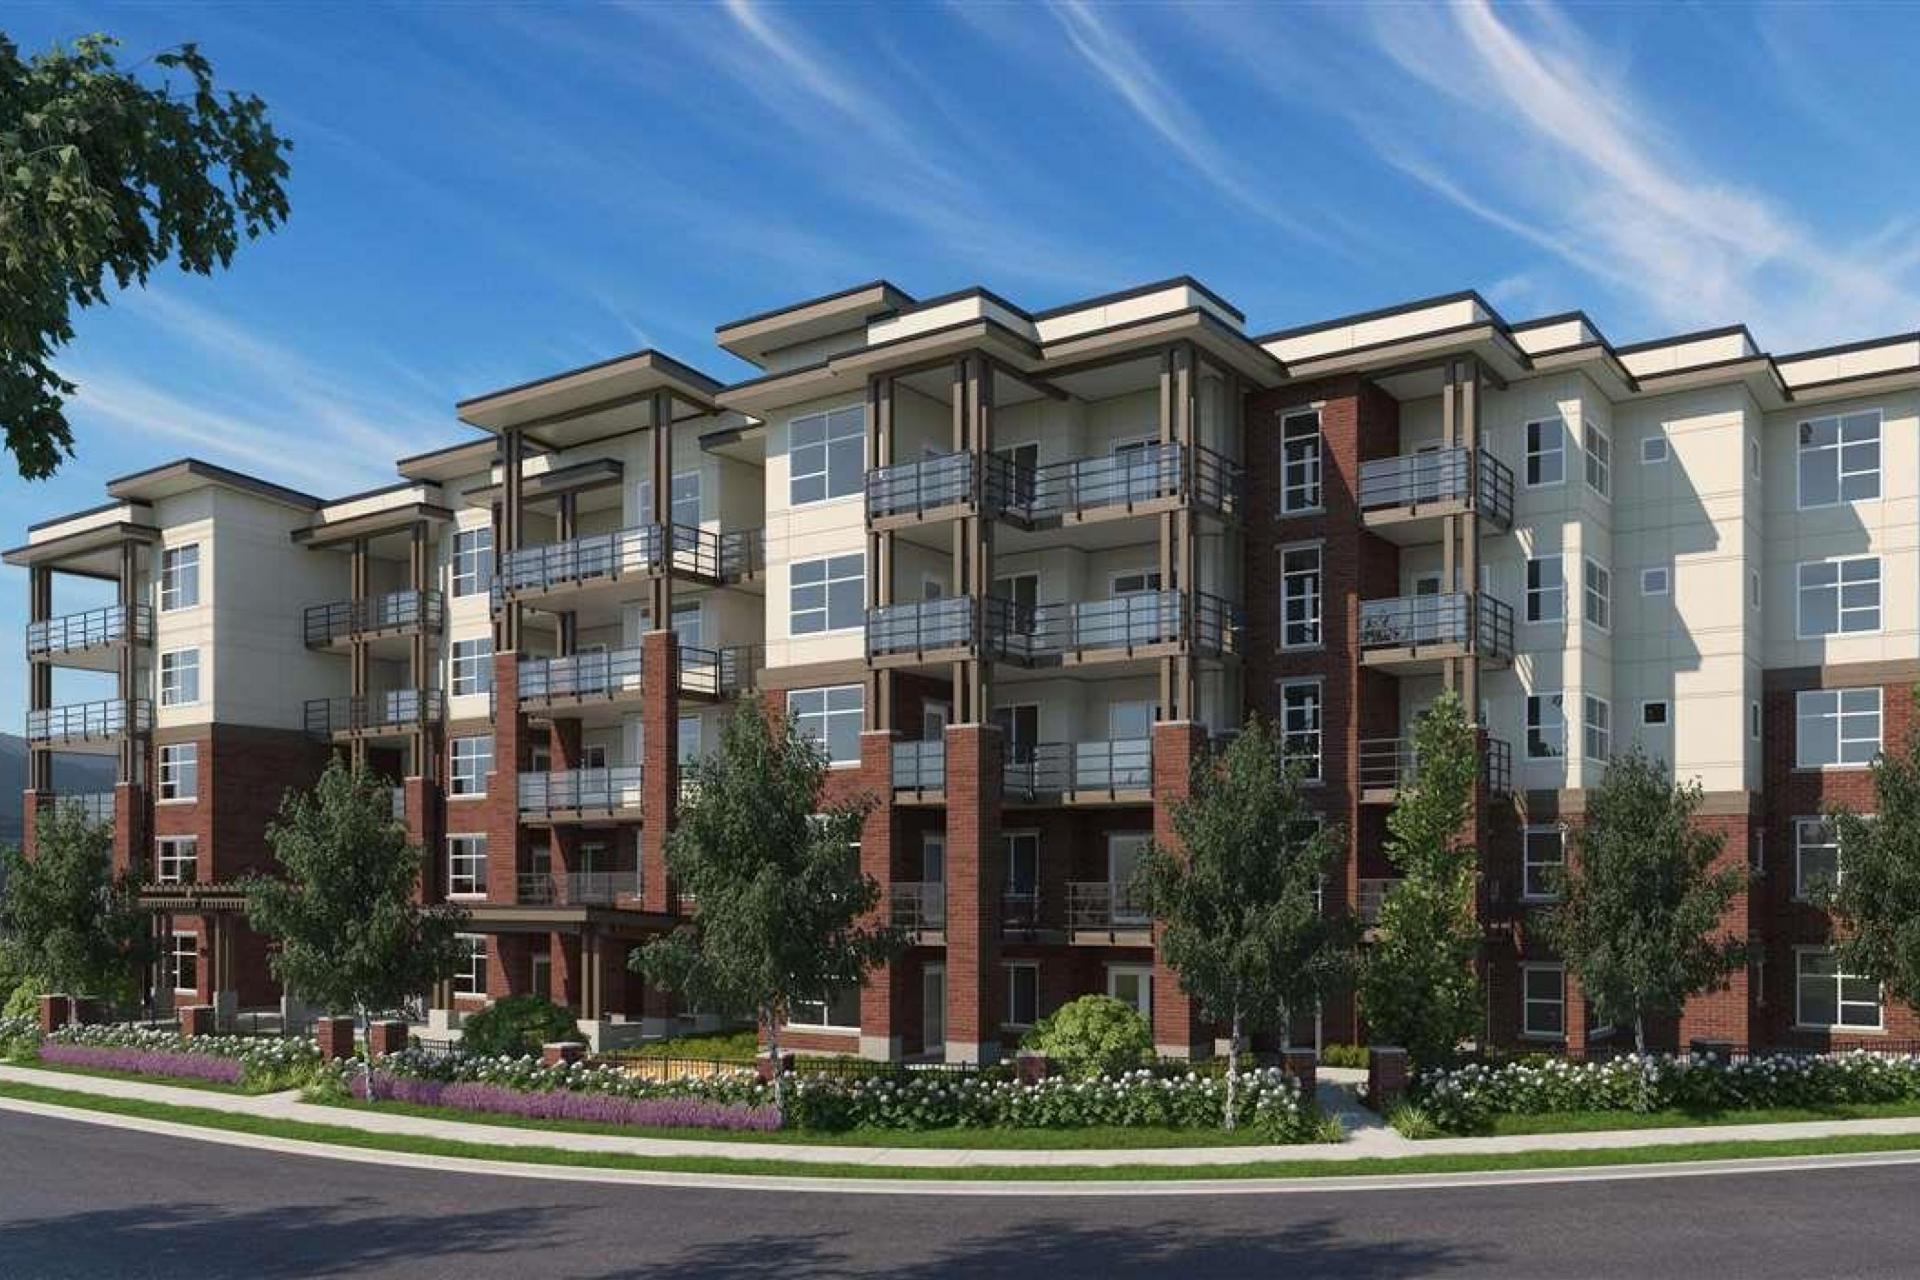 109 - 22577 Royal Crescent, East Central, Maple Ridge